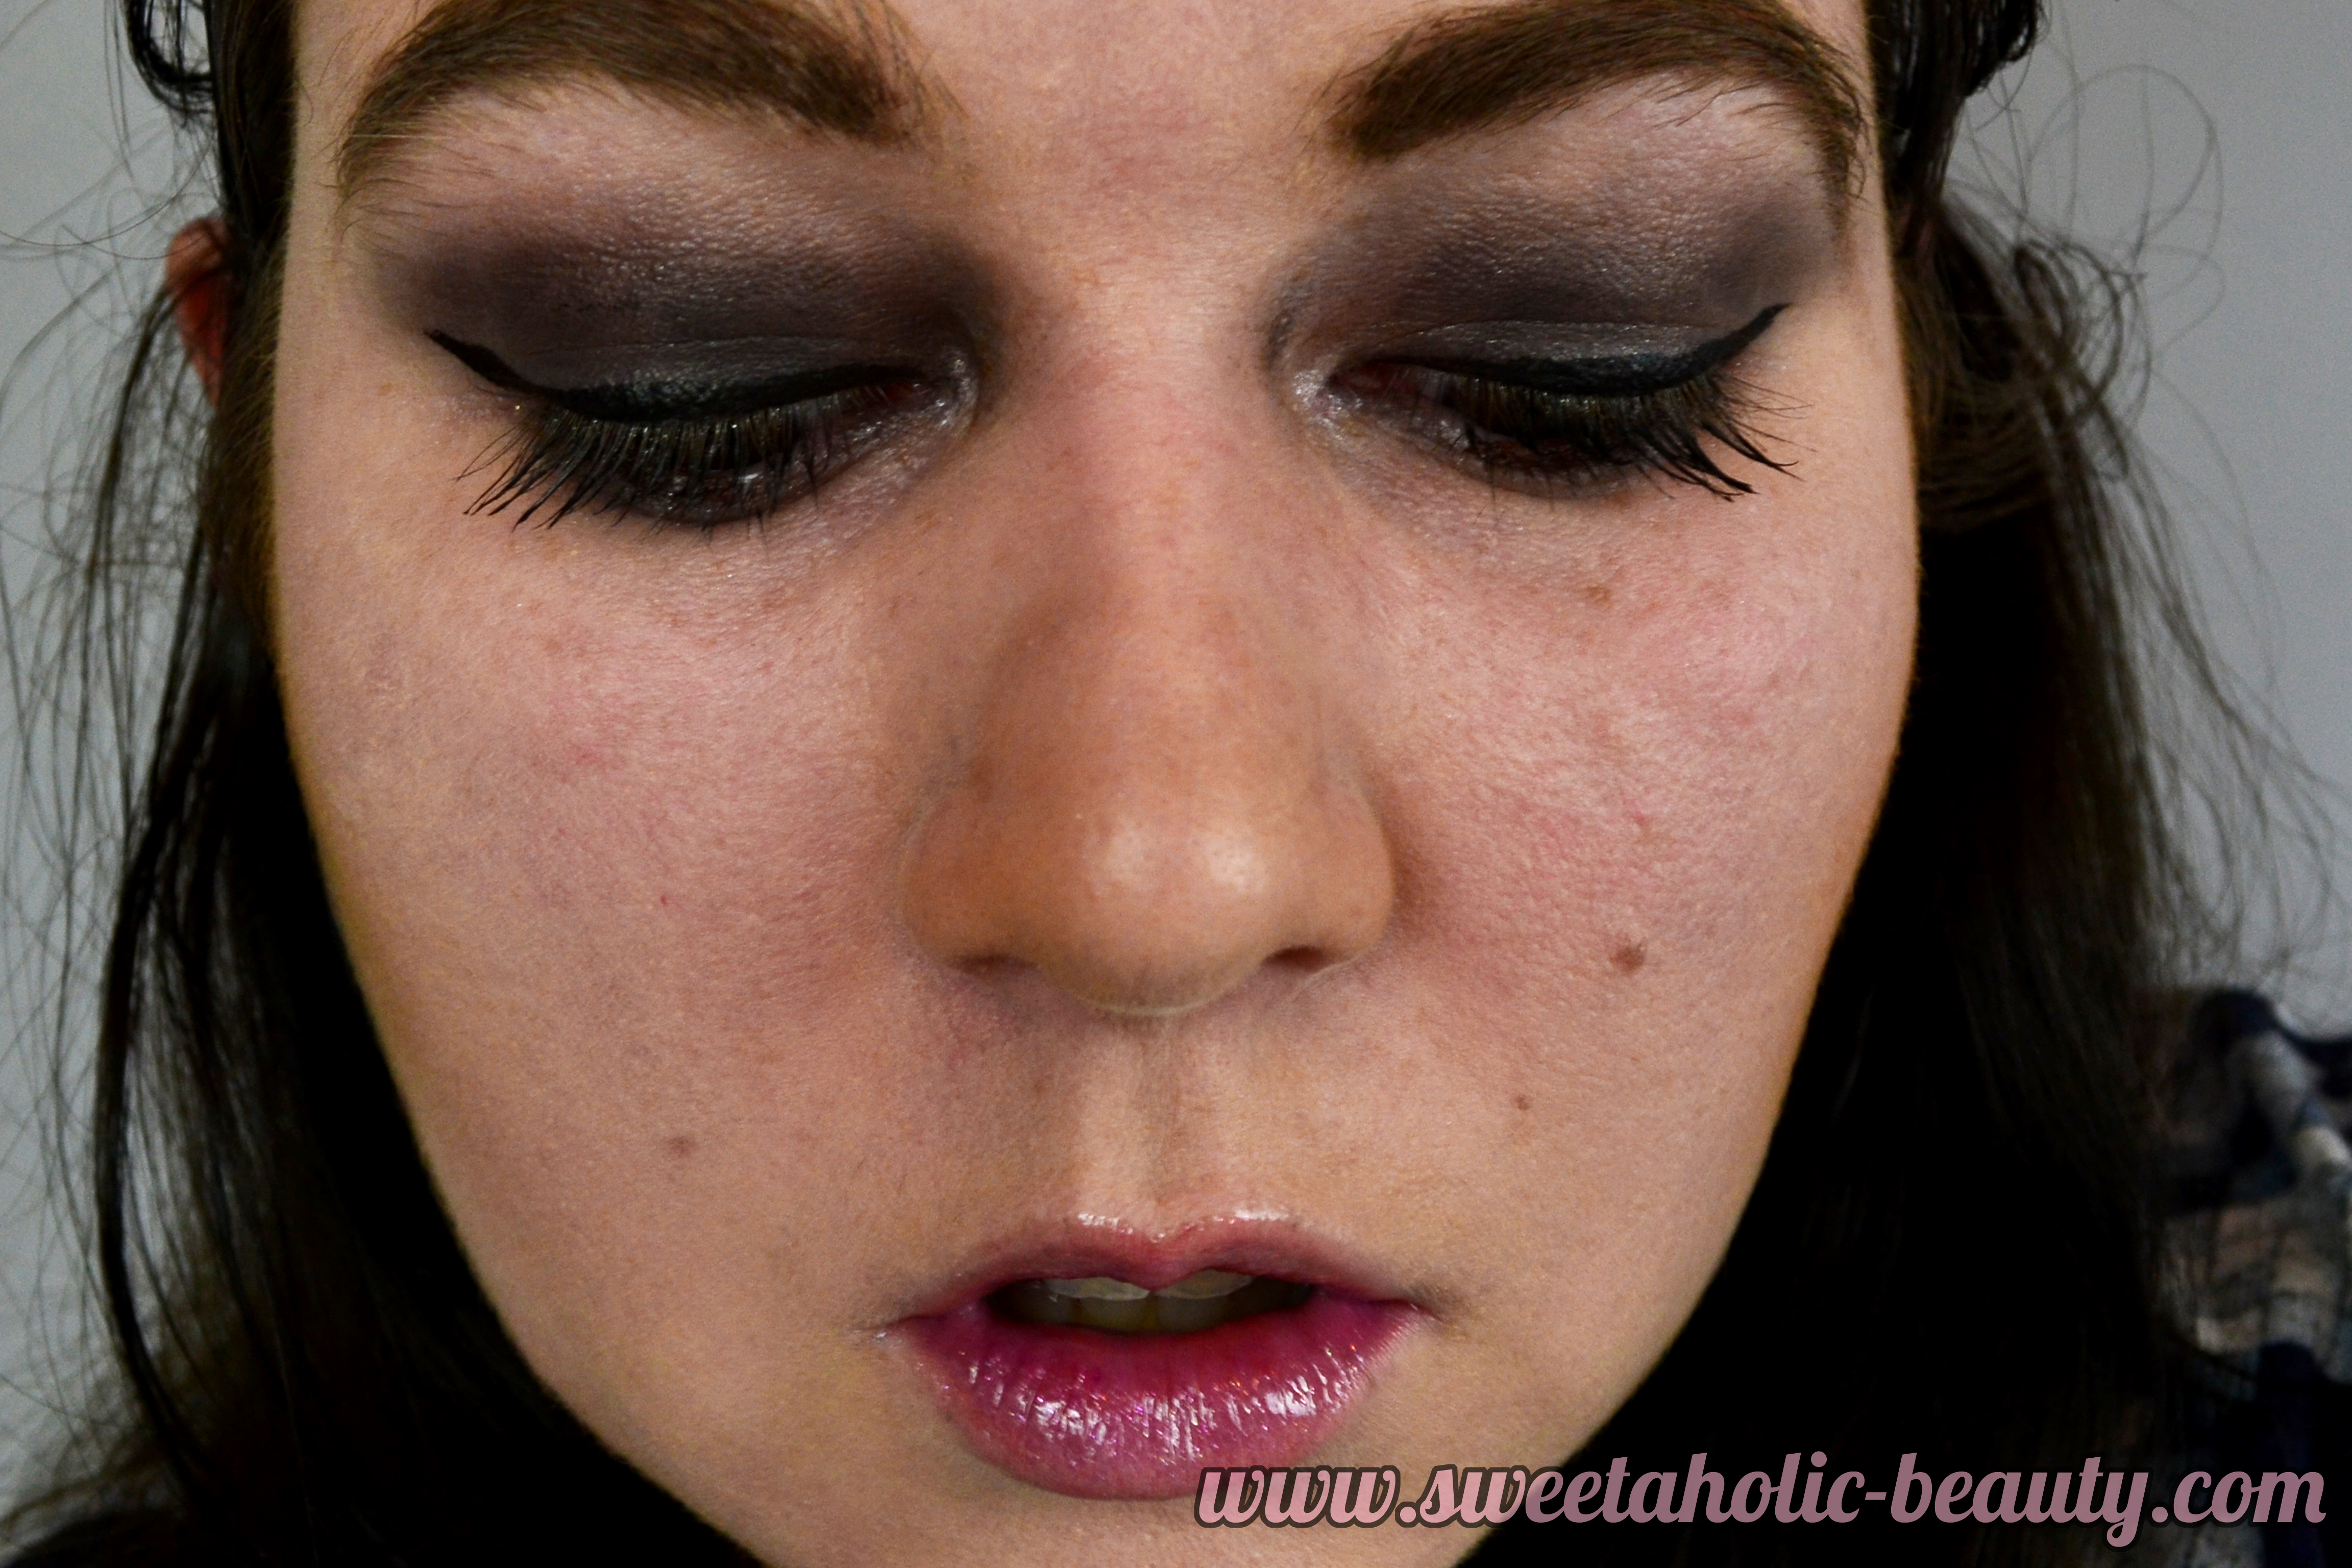 Collaboration - Beauty Through The Decades: Futuristic - Sweetaholic Beauty